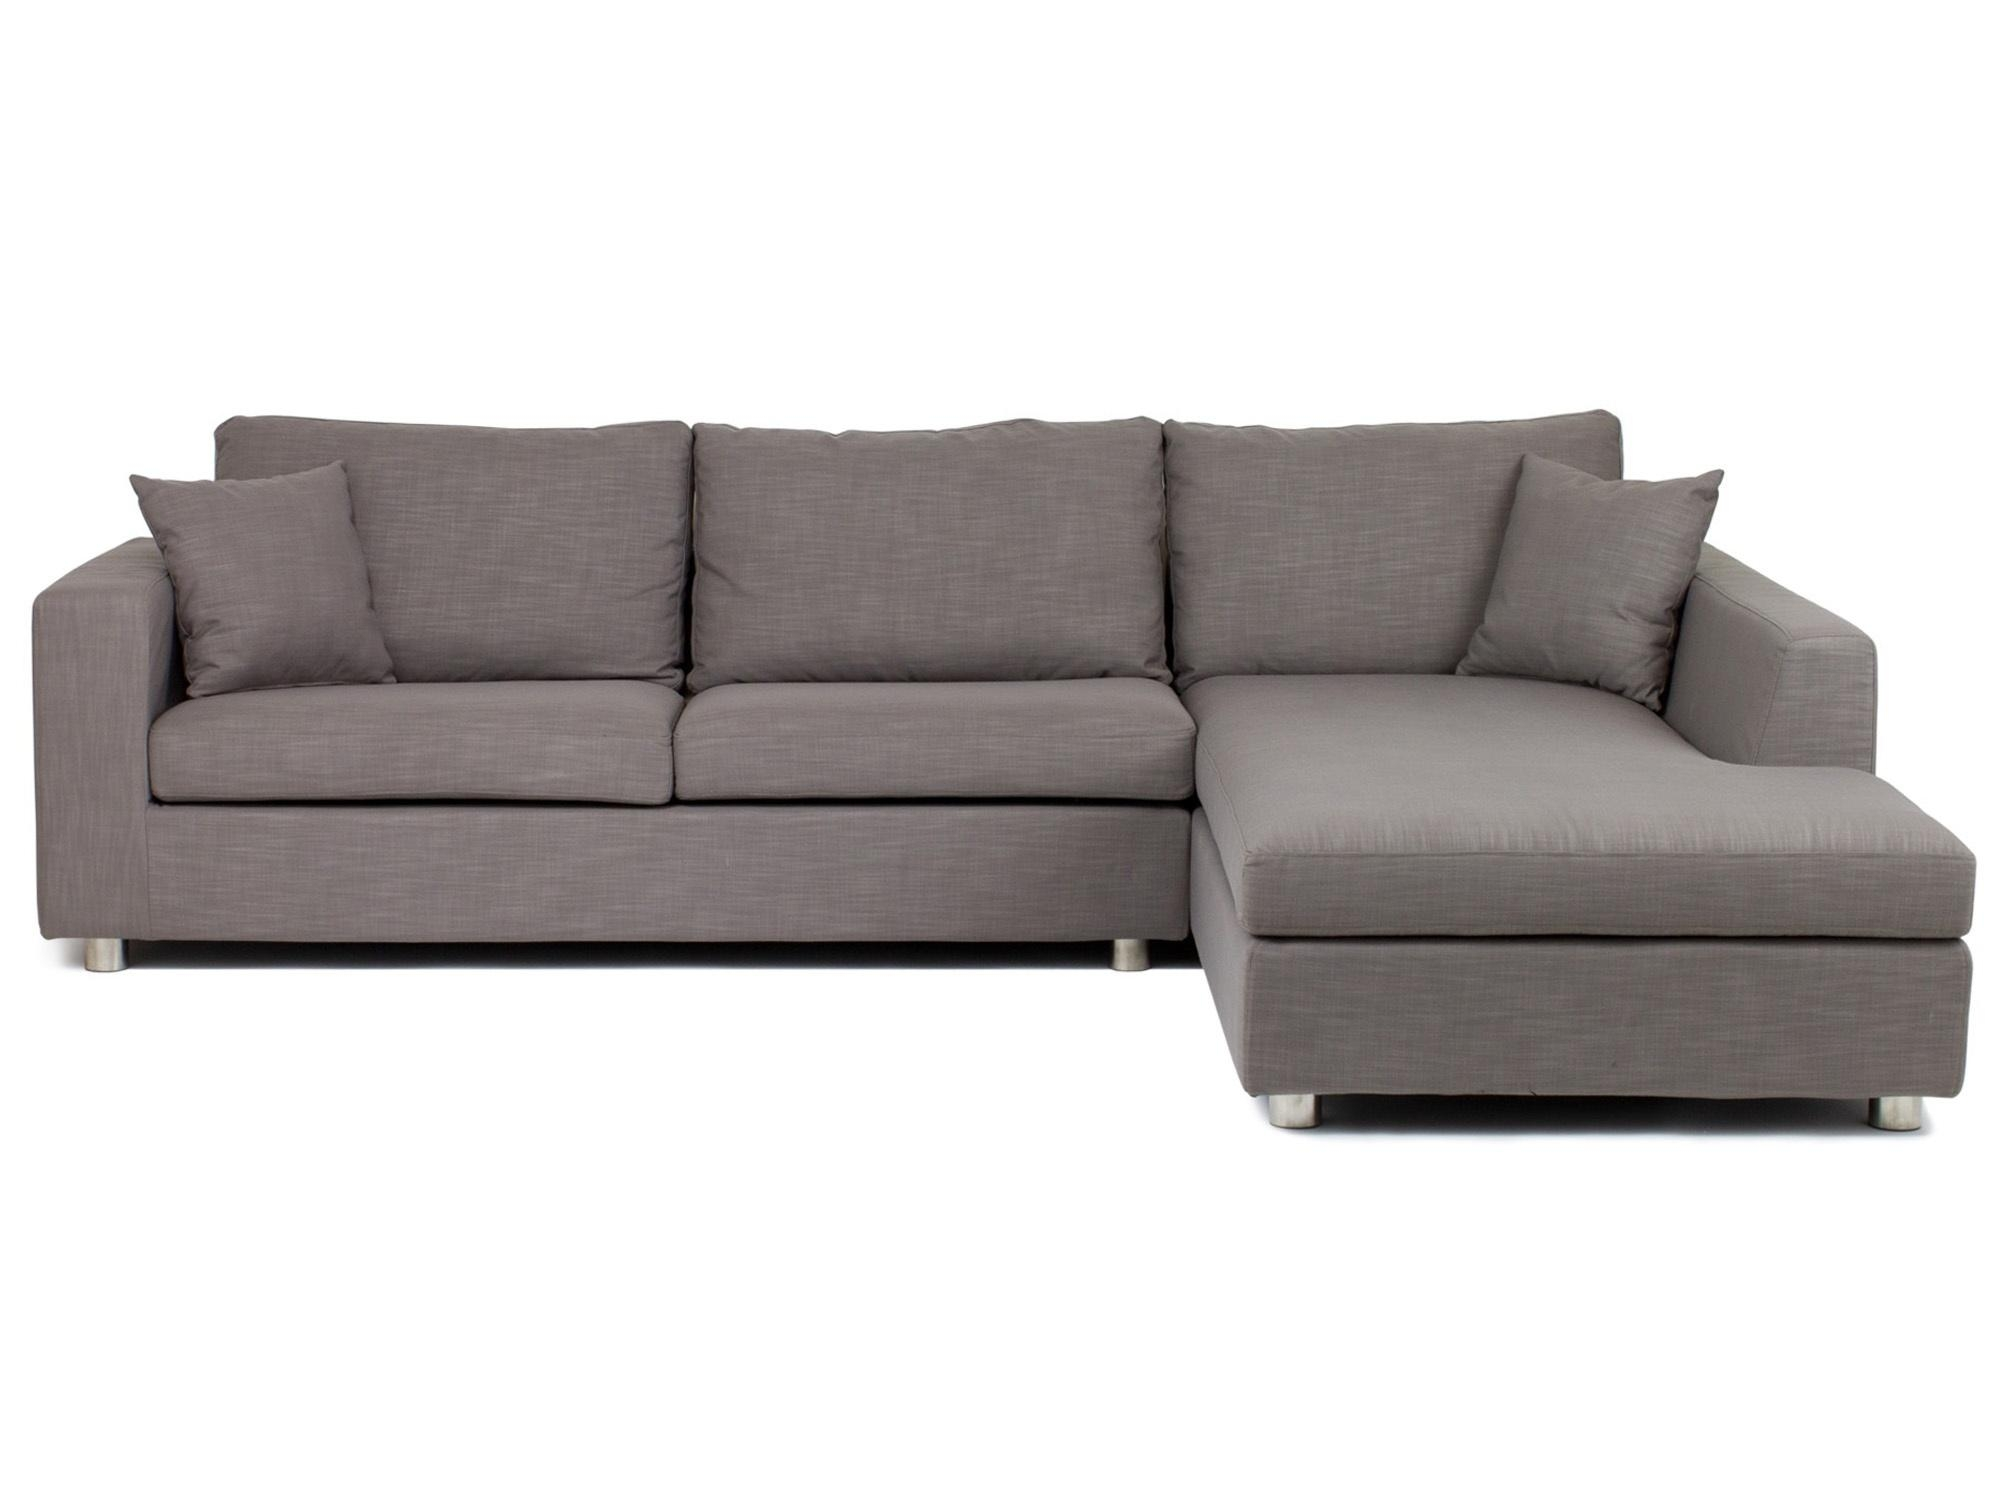 Sofas Center : Ikea Corner Sofa With Storage L Shape Storagedfs Pertaining To Ikea Corner Sofa Bed With Storage (View 16 of 20)